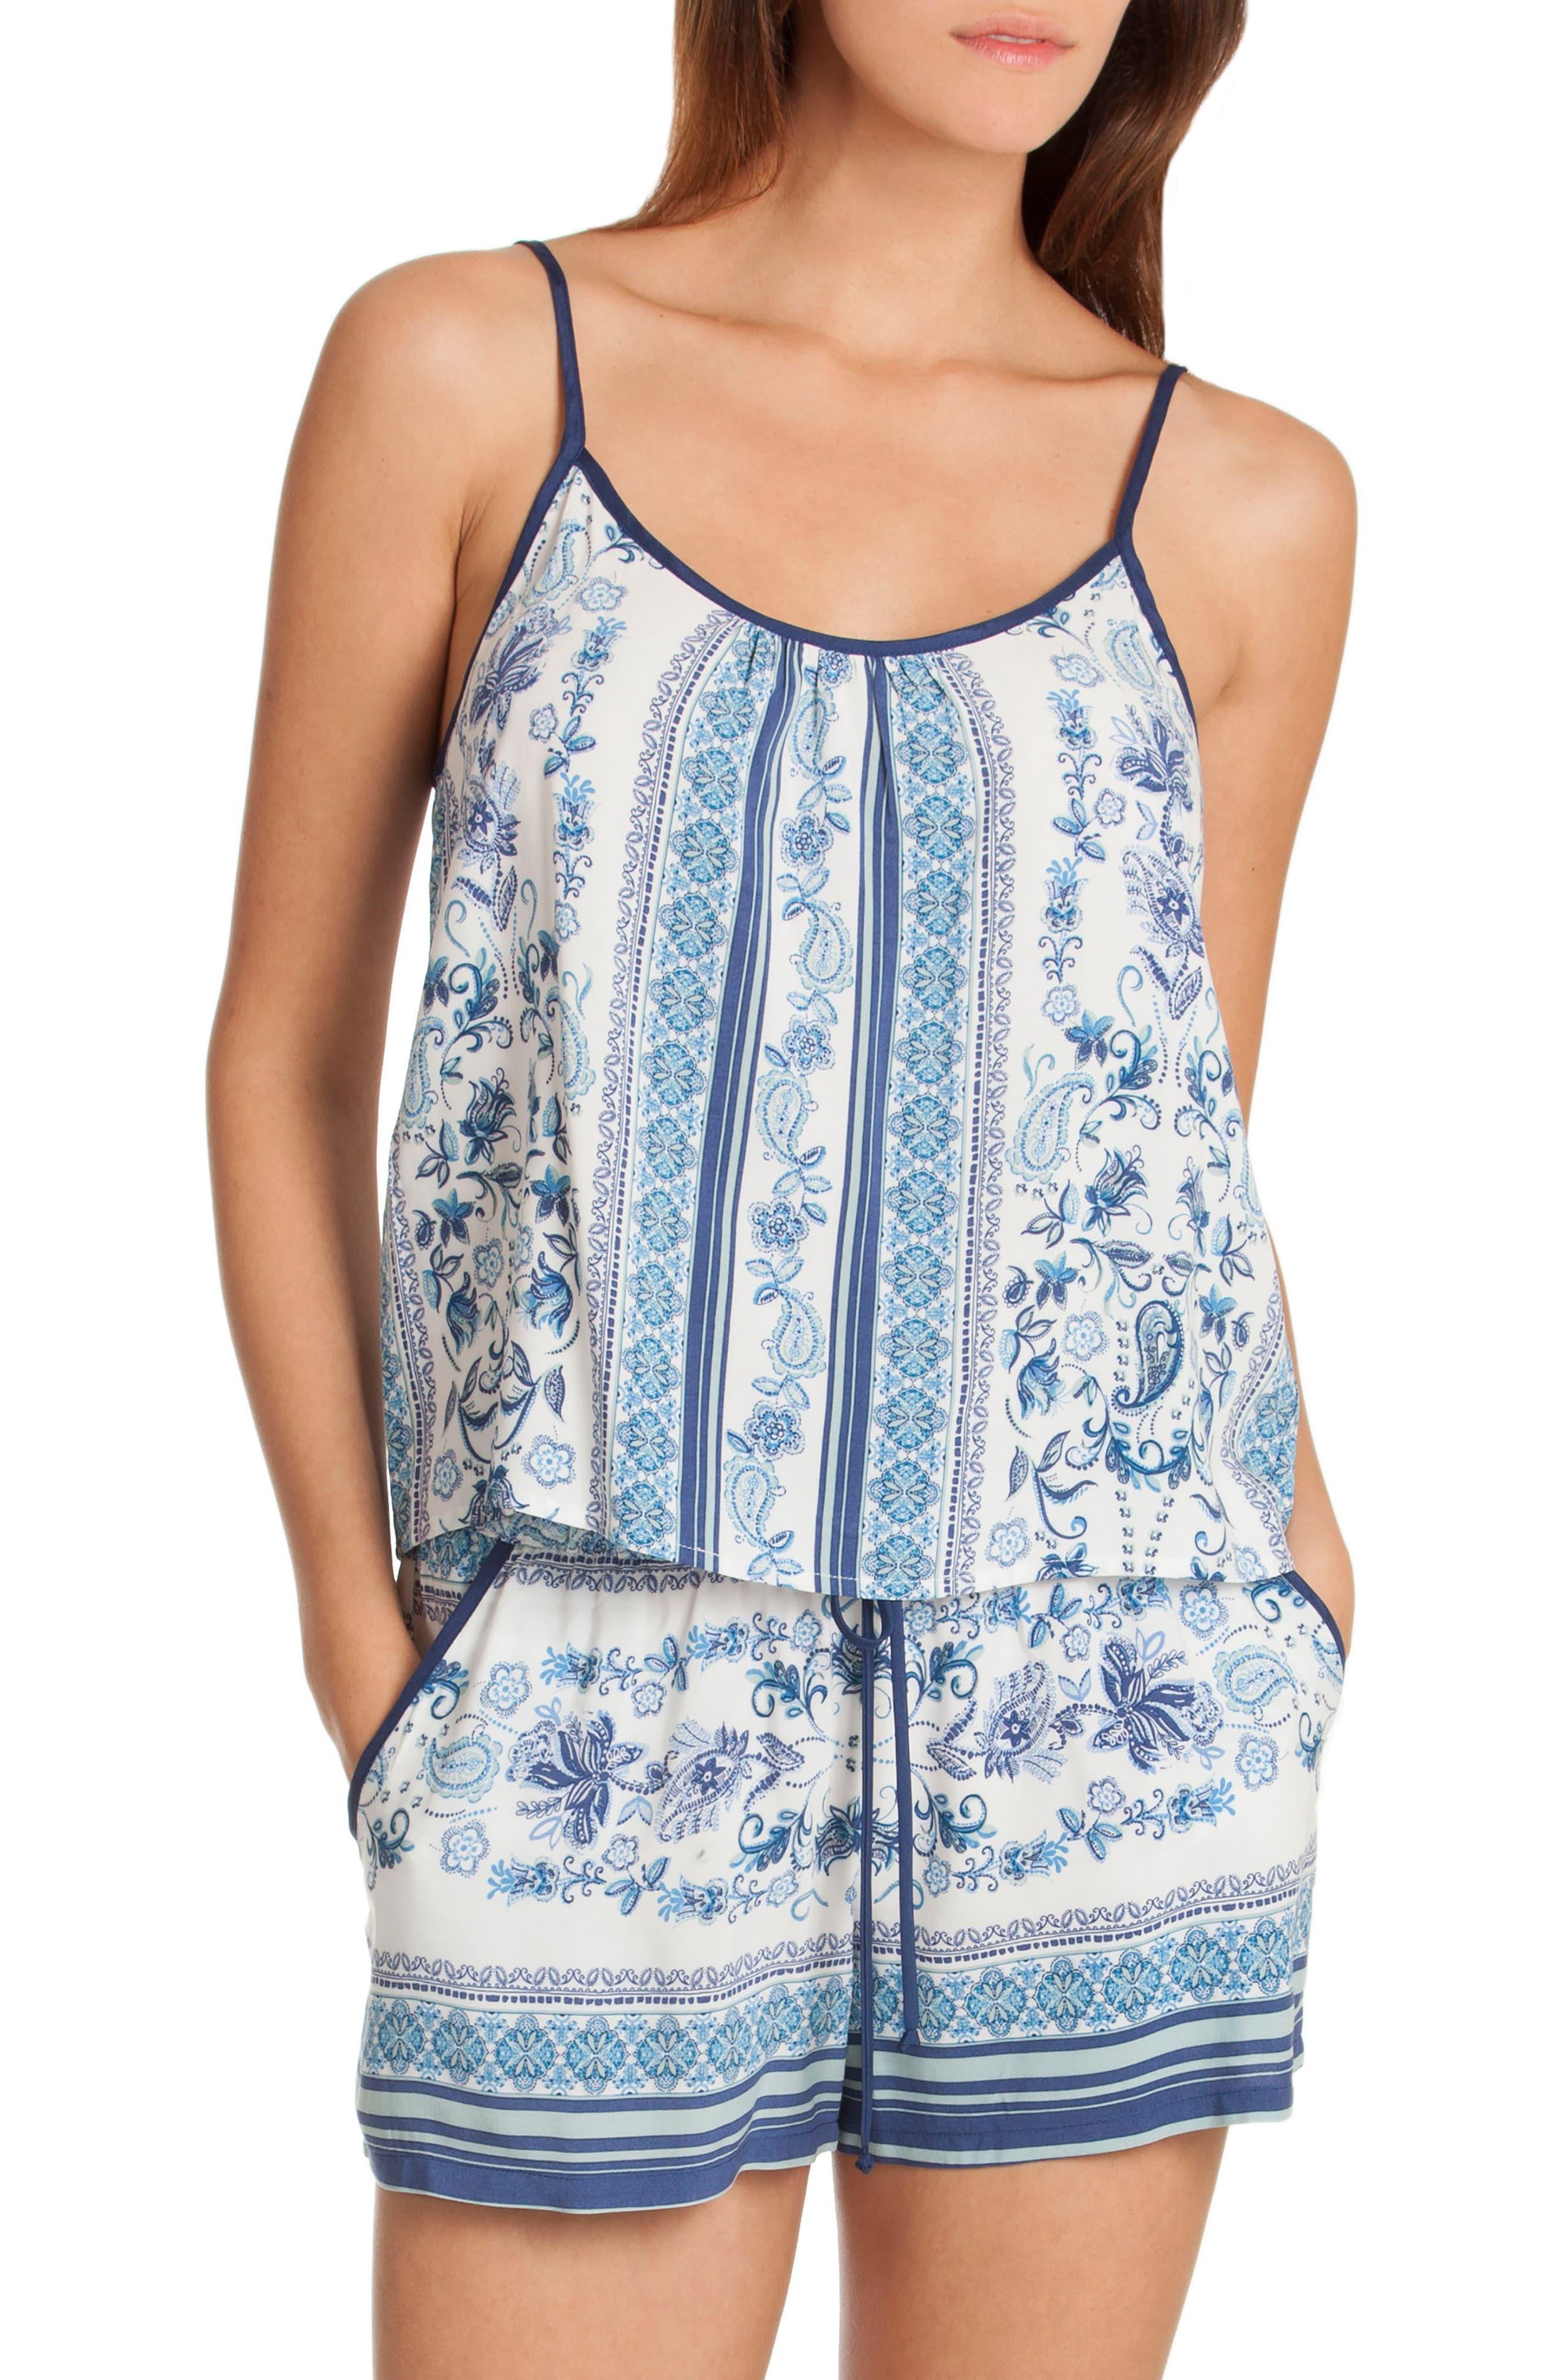 Short Pajamas,                             Main thumbnail 1, color,                             Blue/ White Print